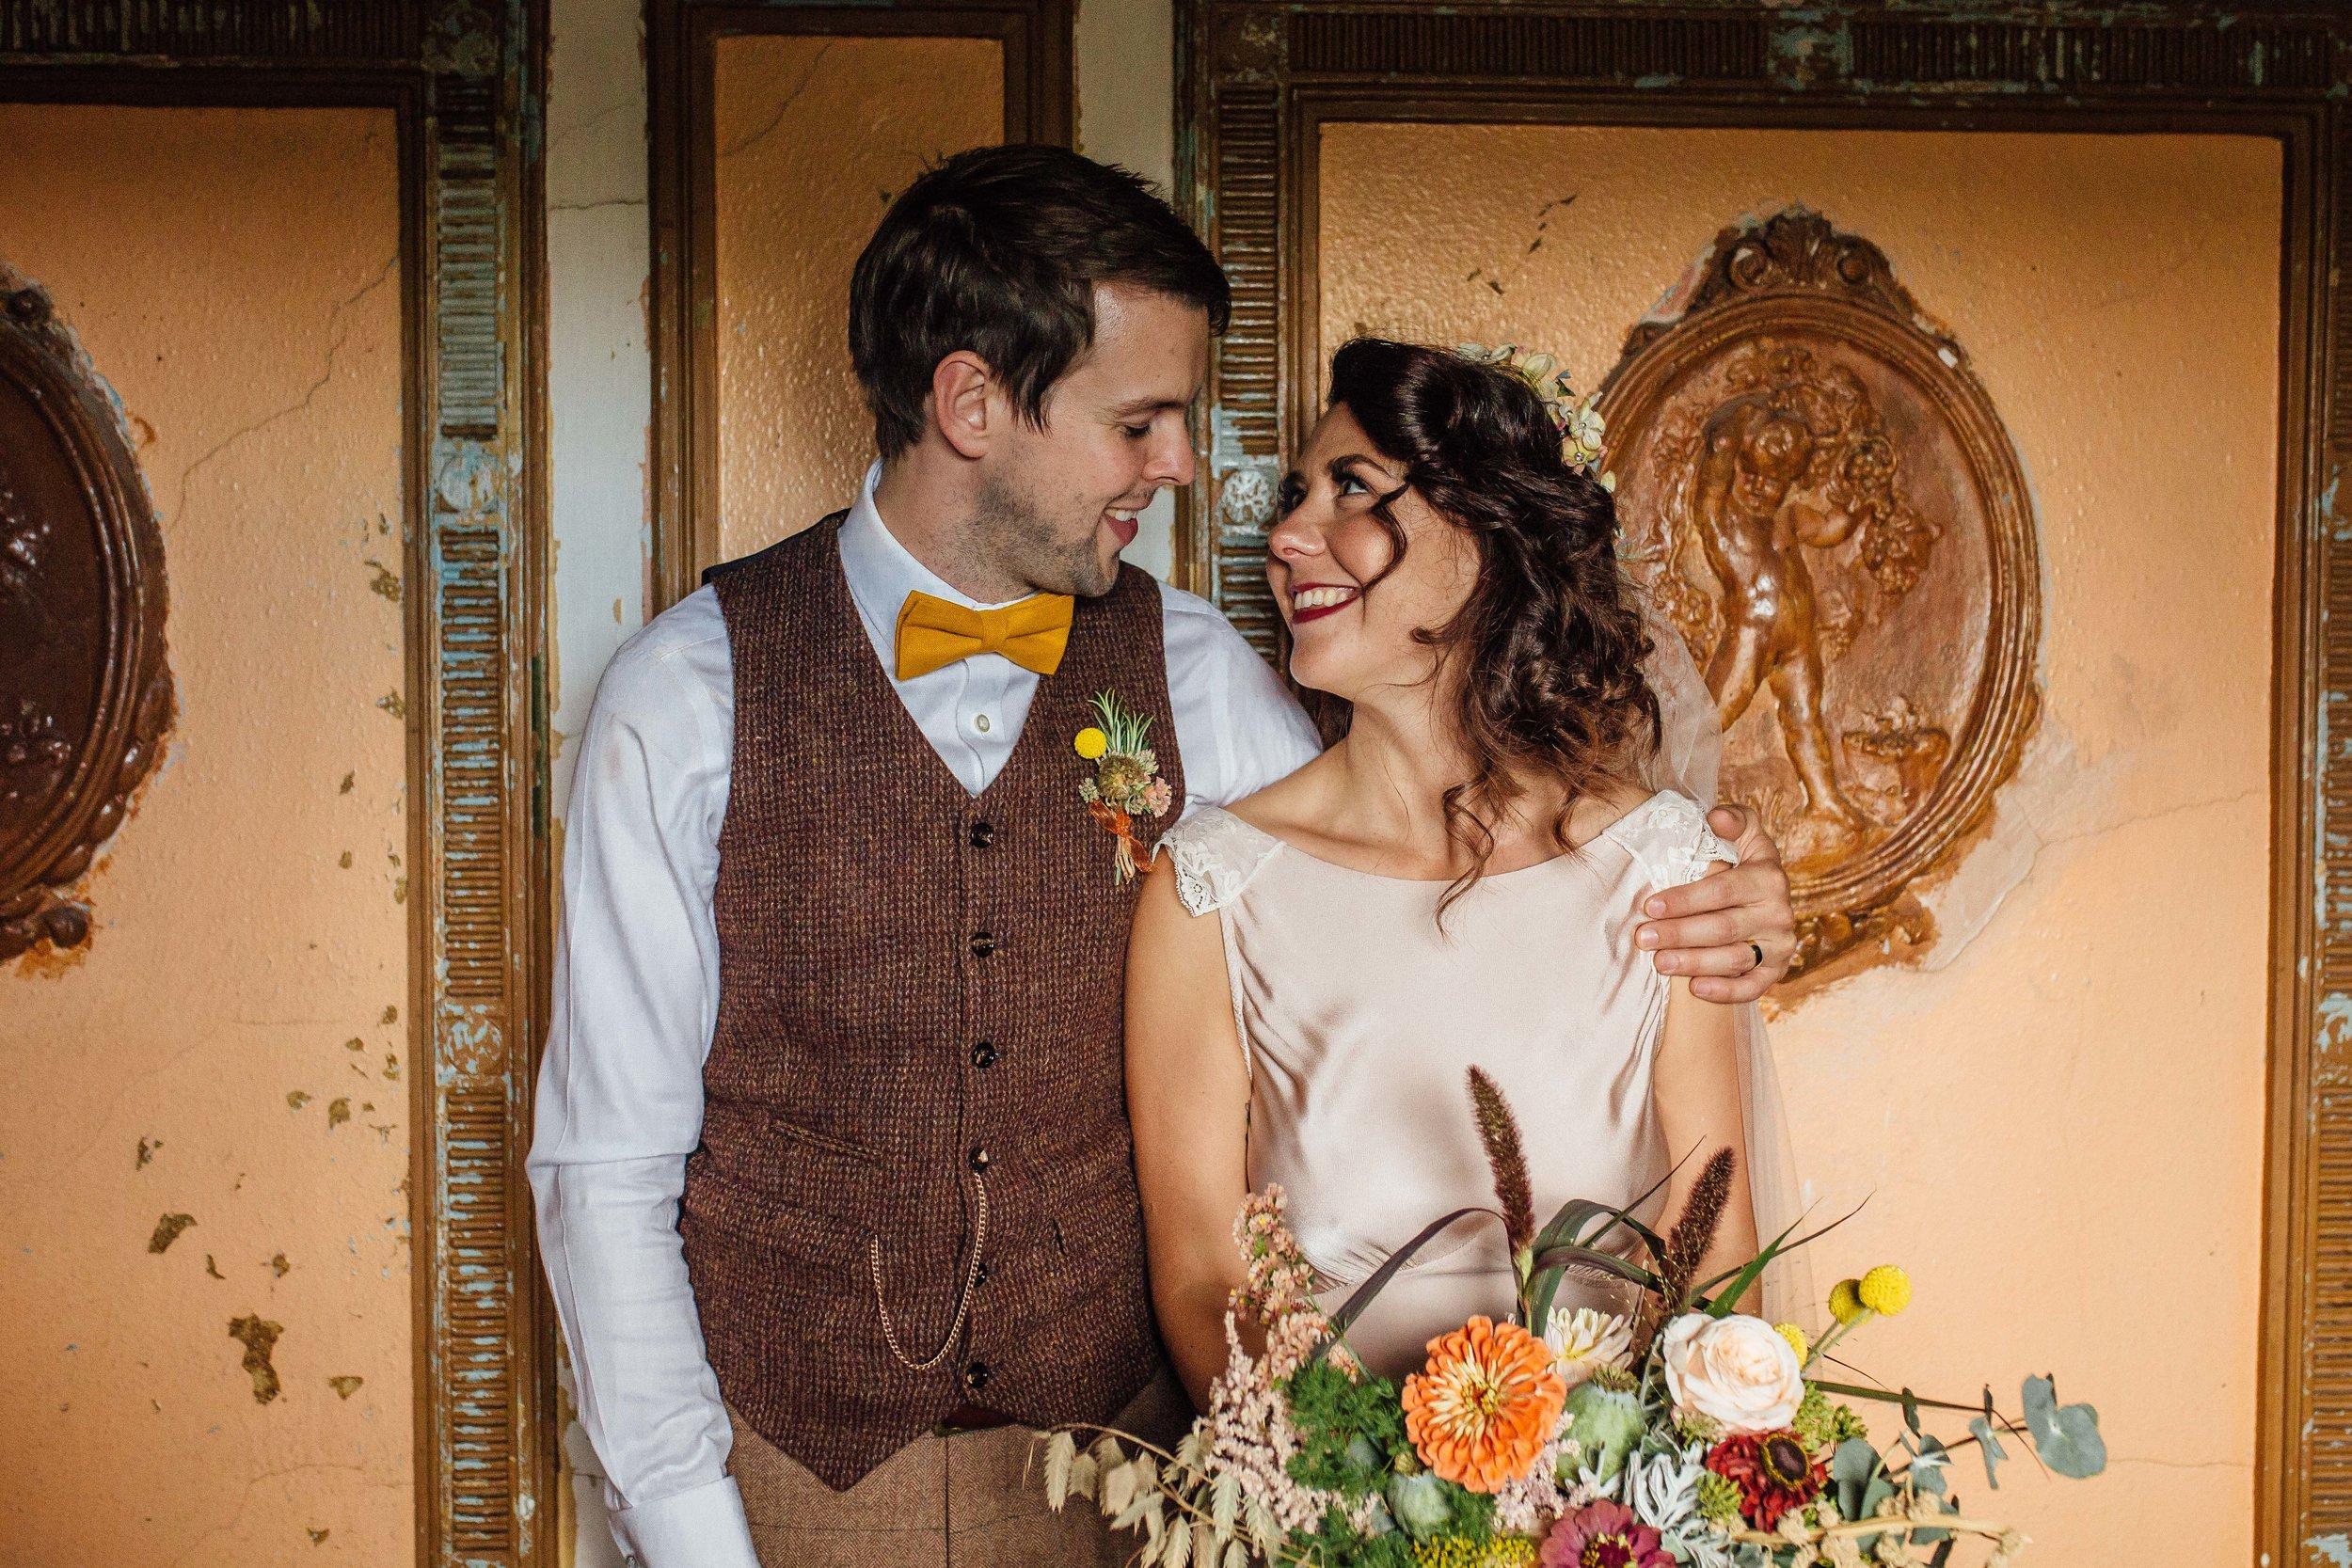 Katy-Bespoke-Veil-Sheffield-Wedding-Wes-Anderson-Susanna-Greening-Derbyshire-24